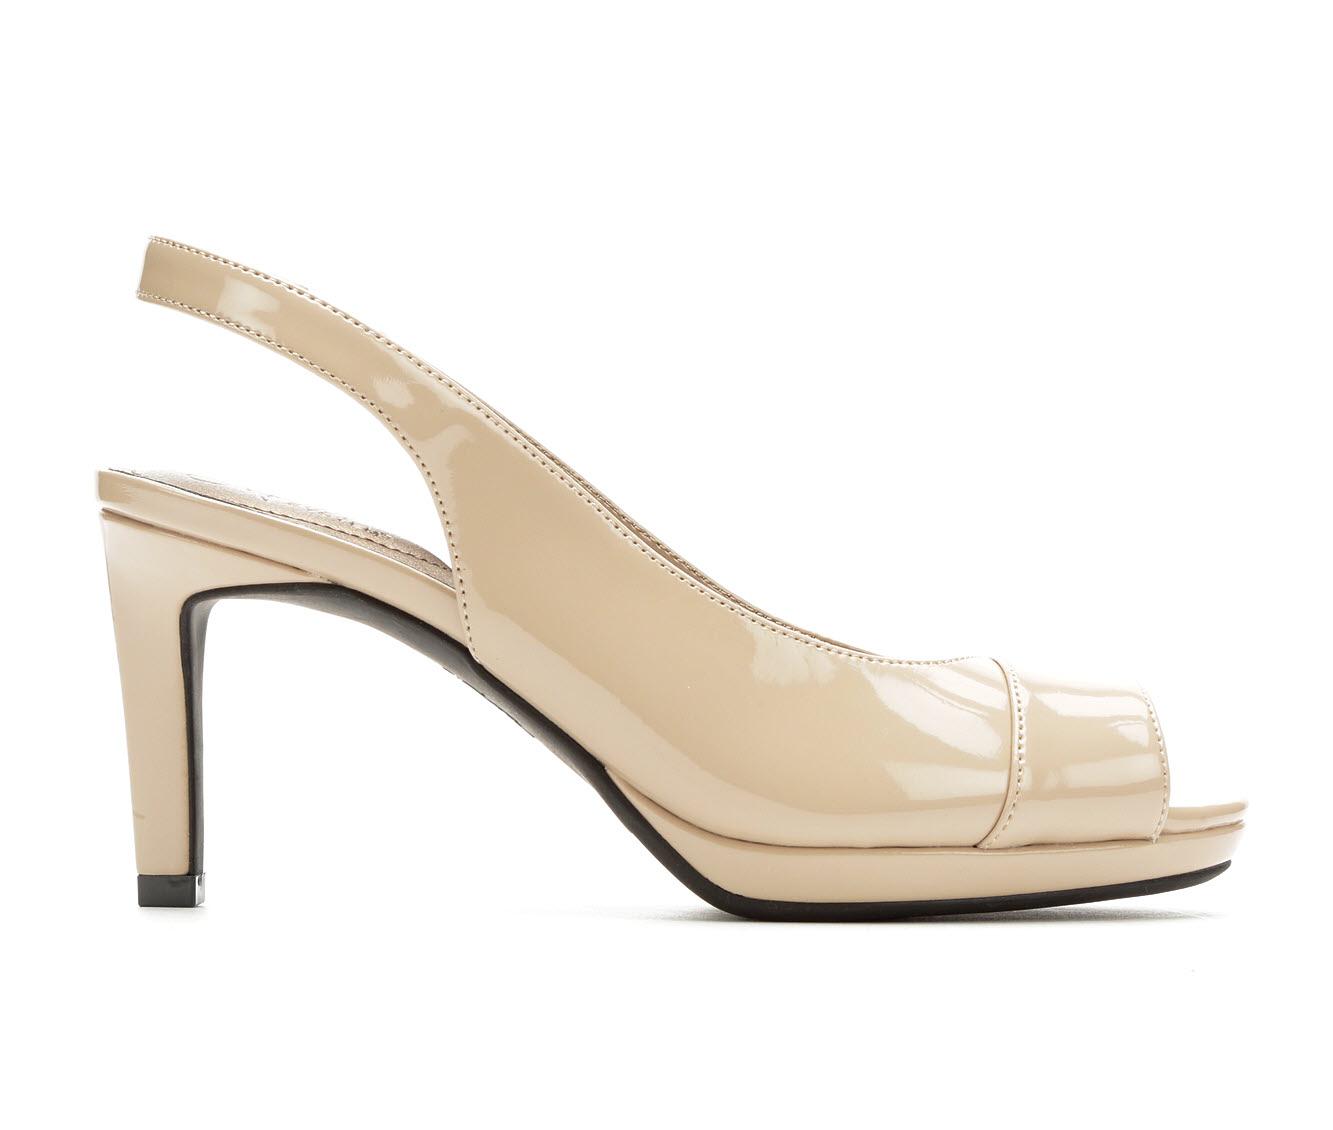 LifeStride Invest Women's Dress Shoe (Beige Faux Leather)